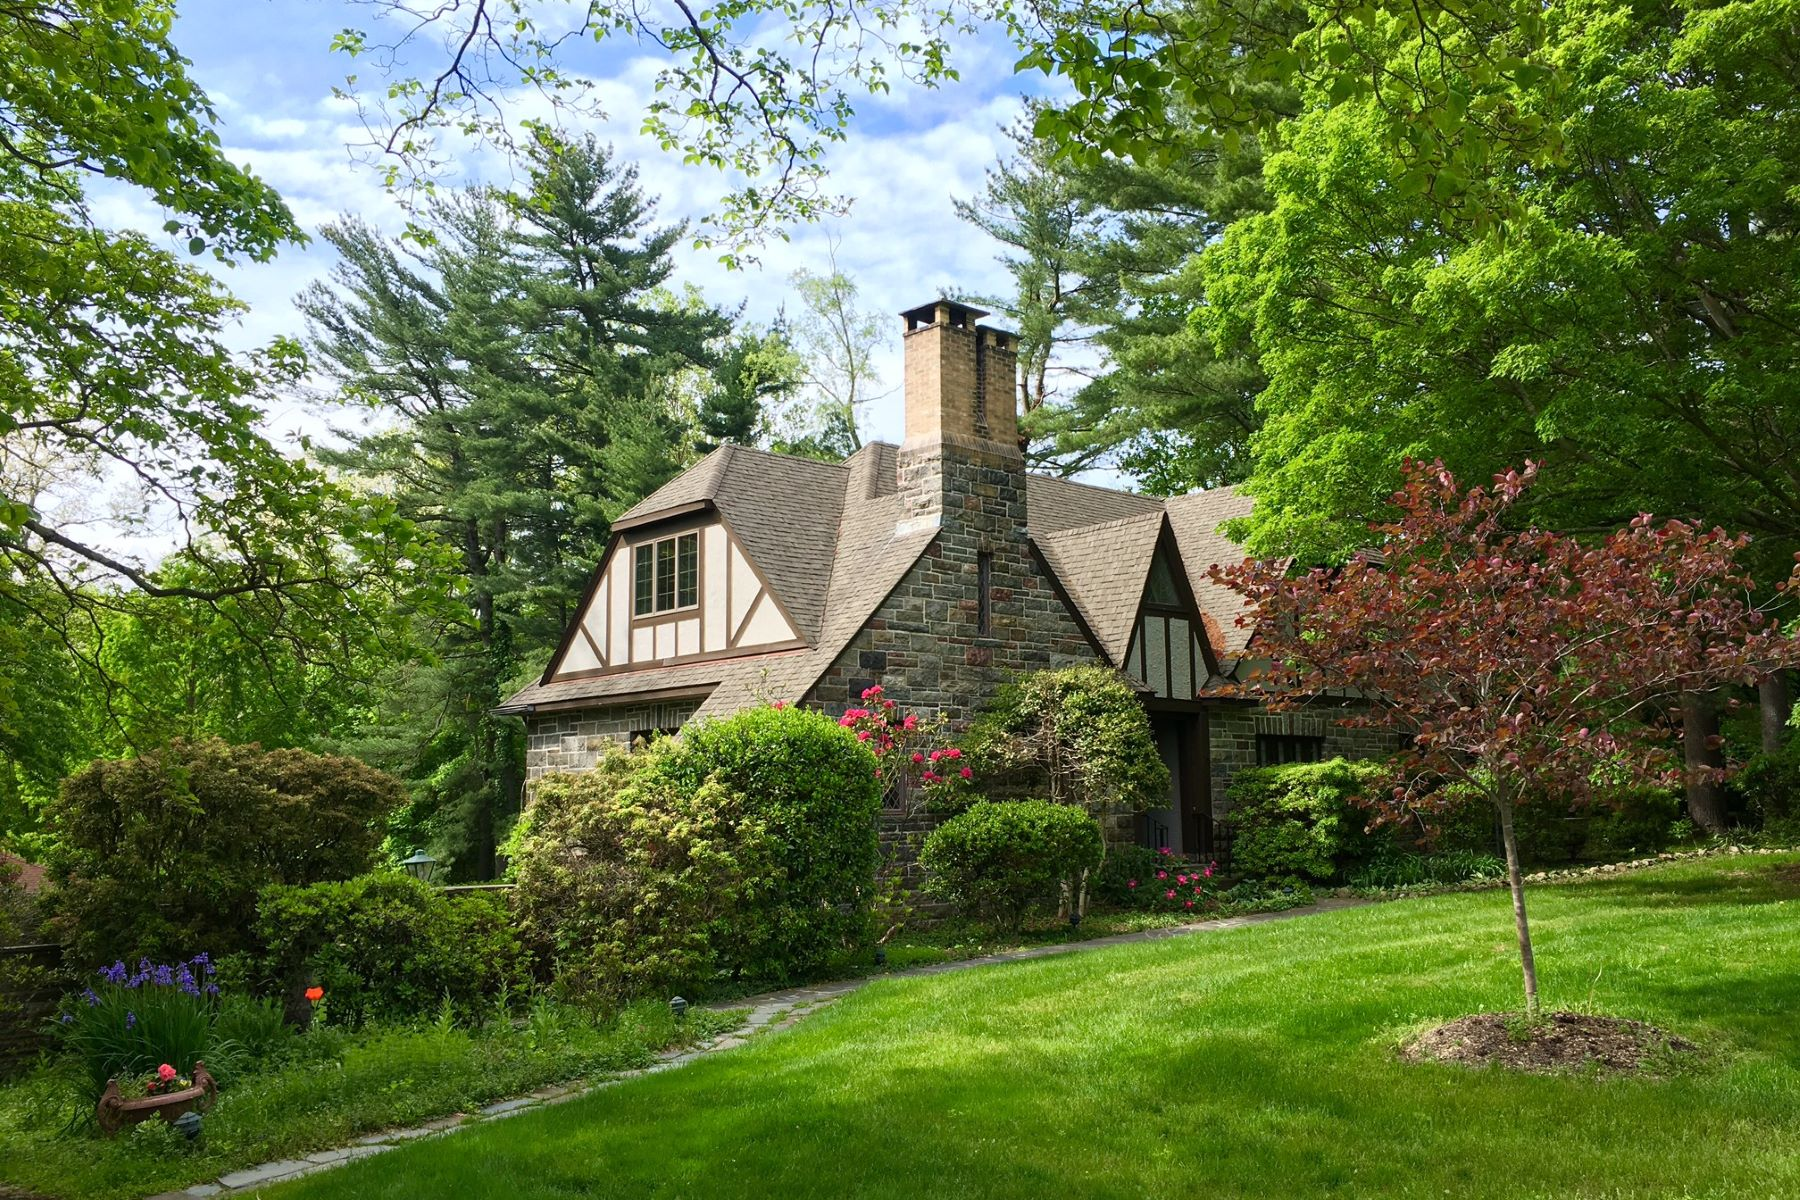 Single Family Home for Sale at c. 1925 Fieldstone Tudor 11 Mile Rd Montebello, New York, 10901 United States